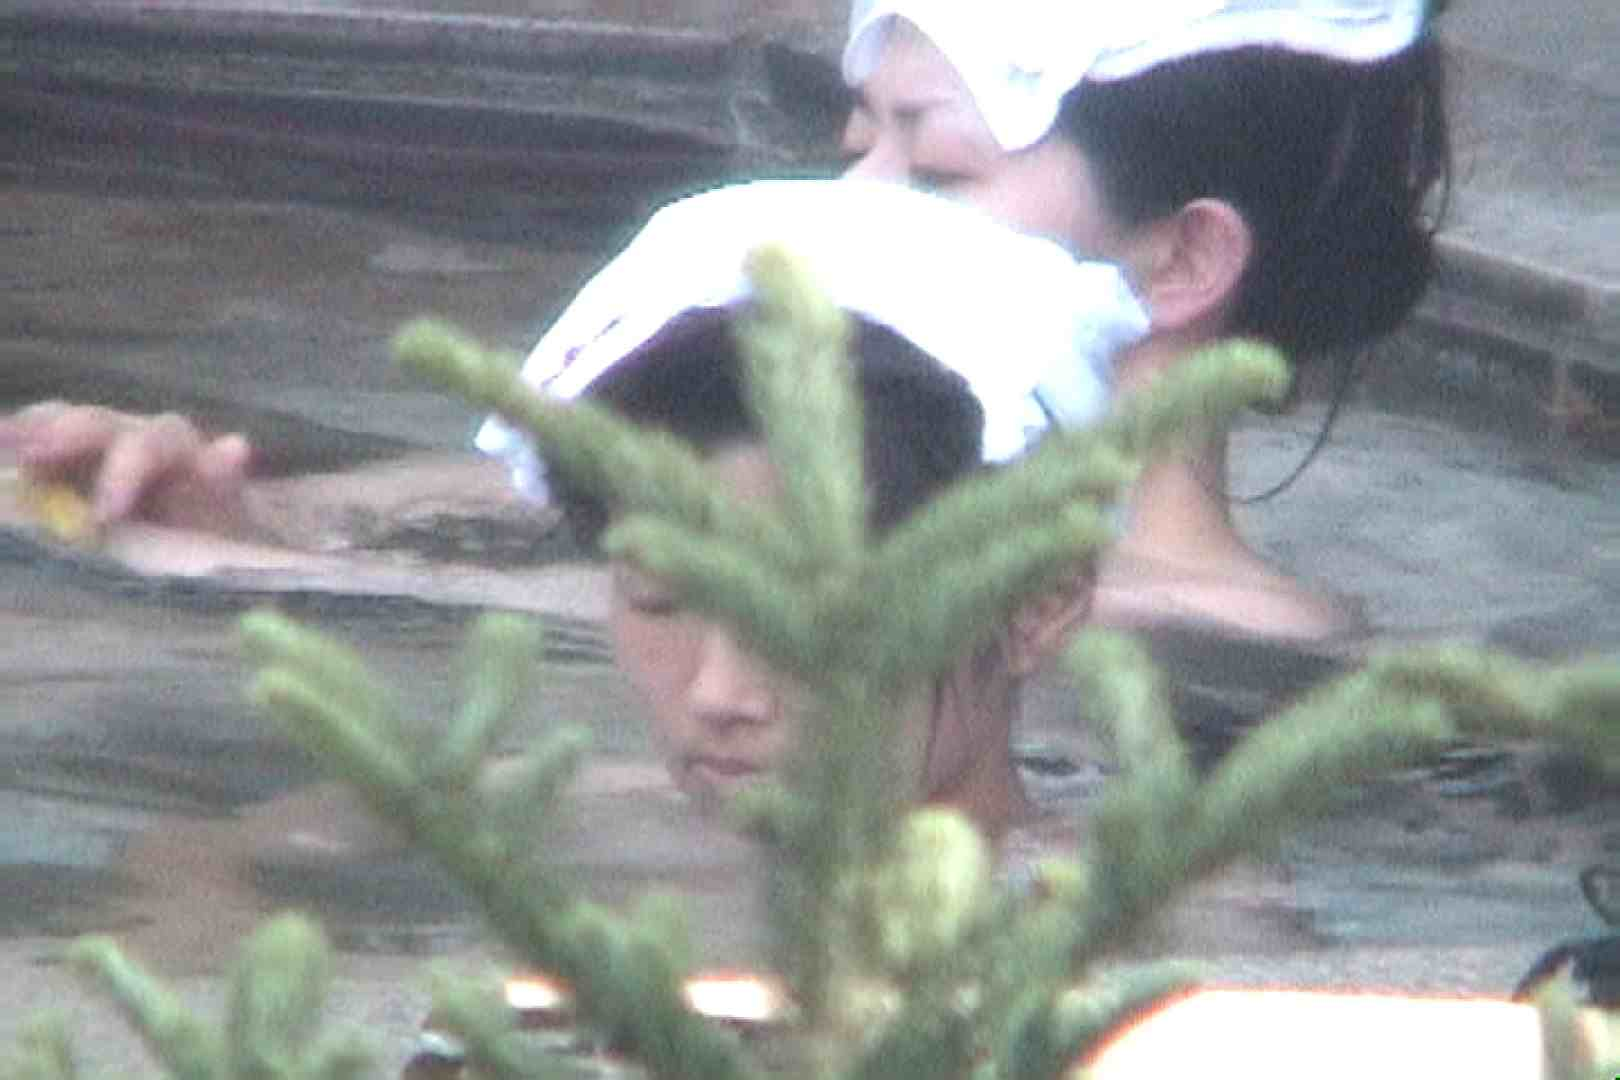 Aquaな露天風呂Vol.80【VIP限定】 盗撮 | HなOL  66pic 34